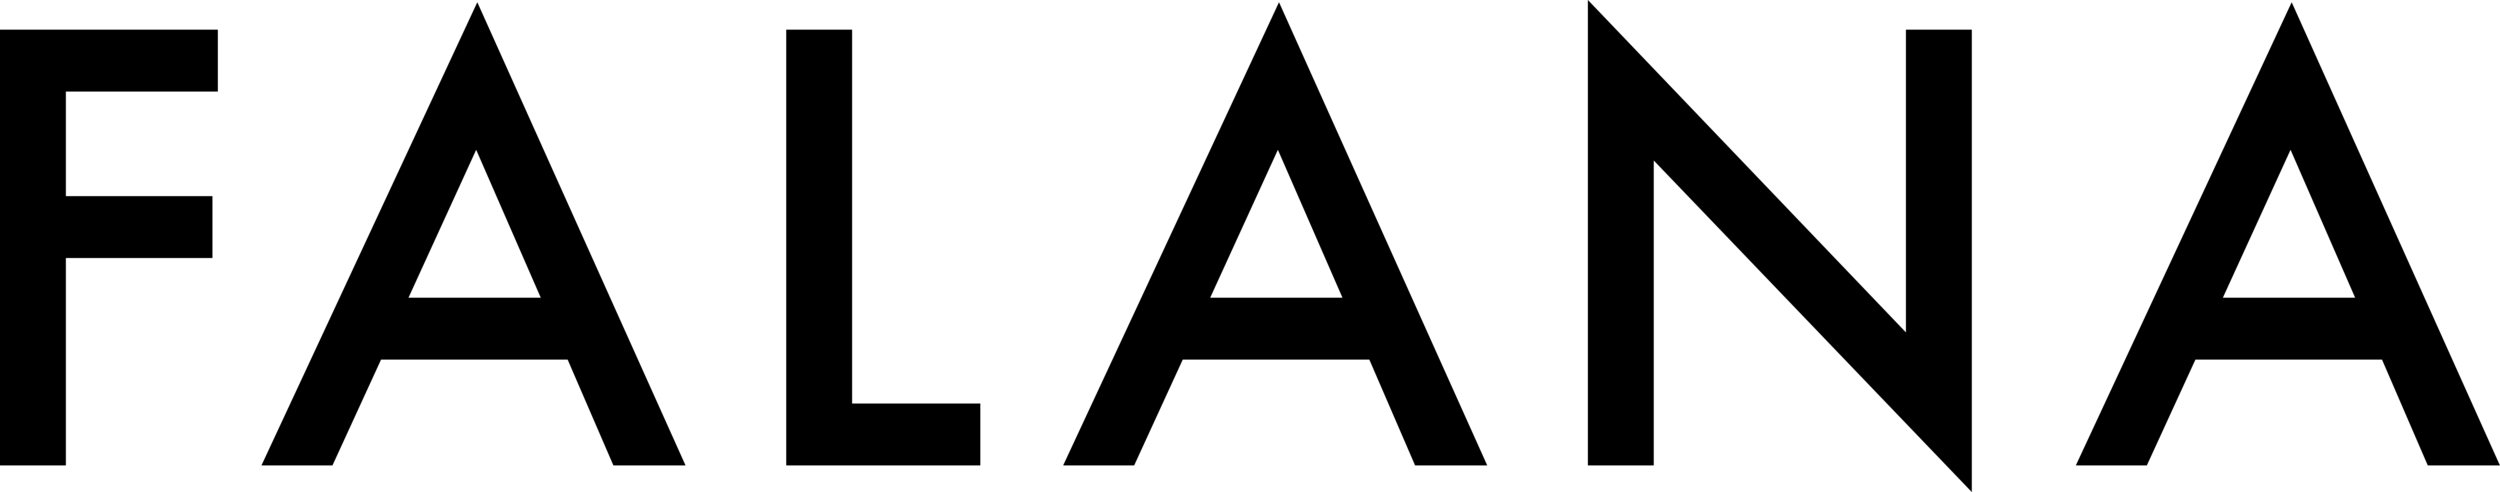 Falana-Logo-Black.png